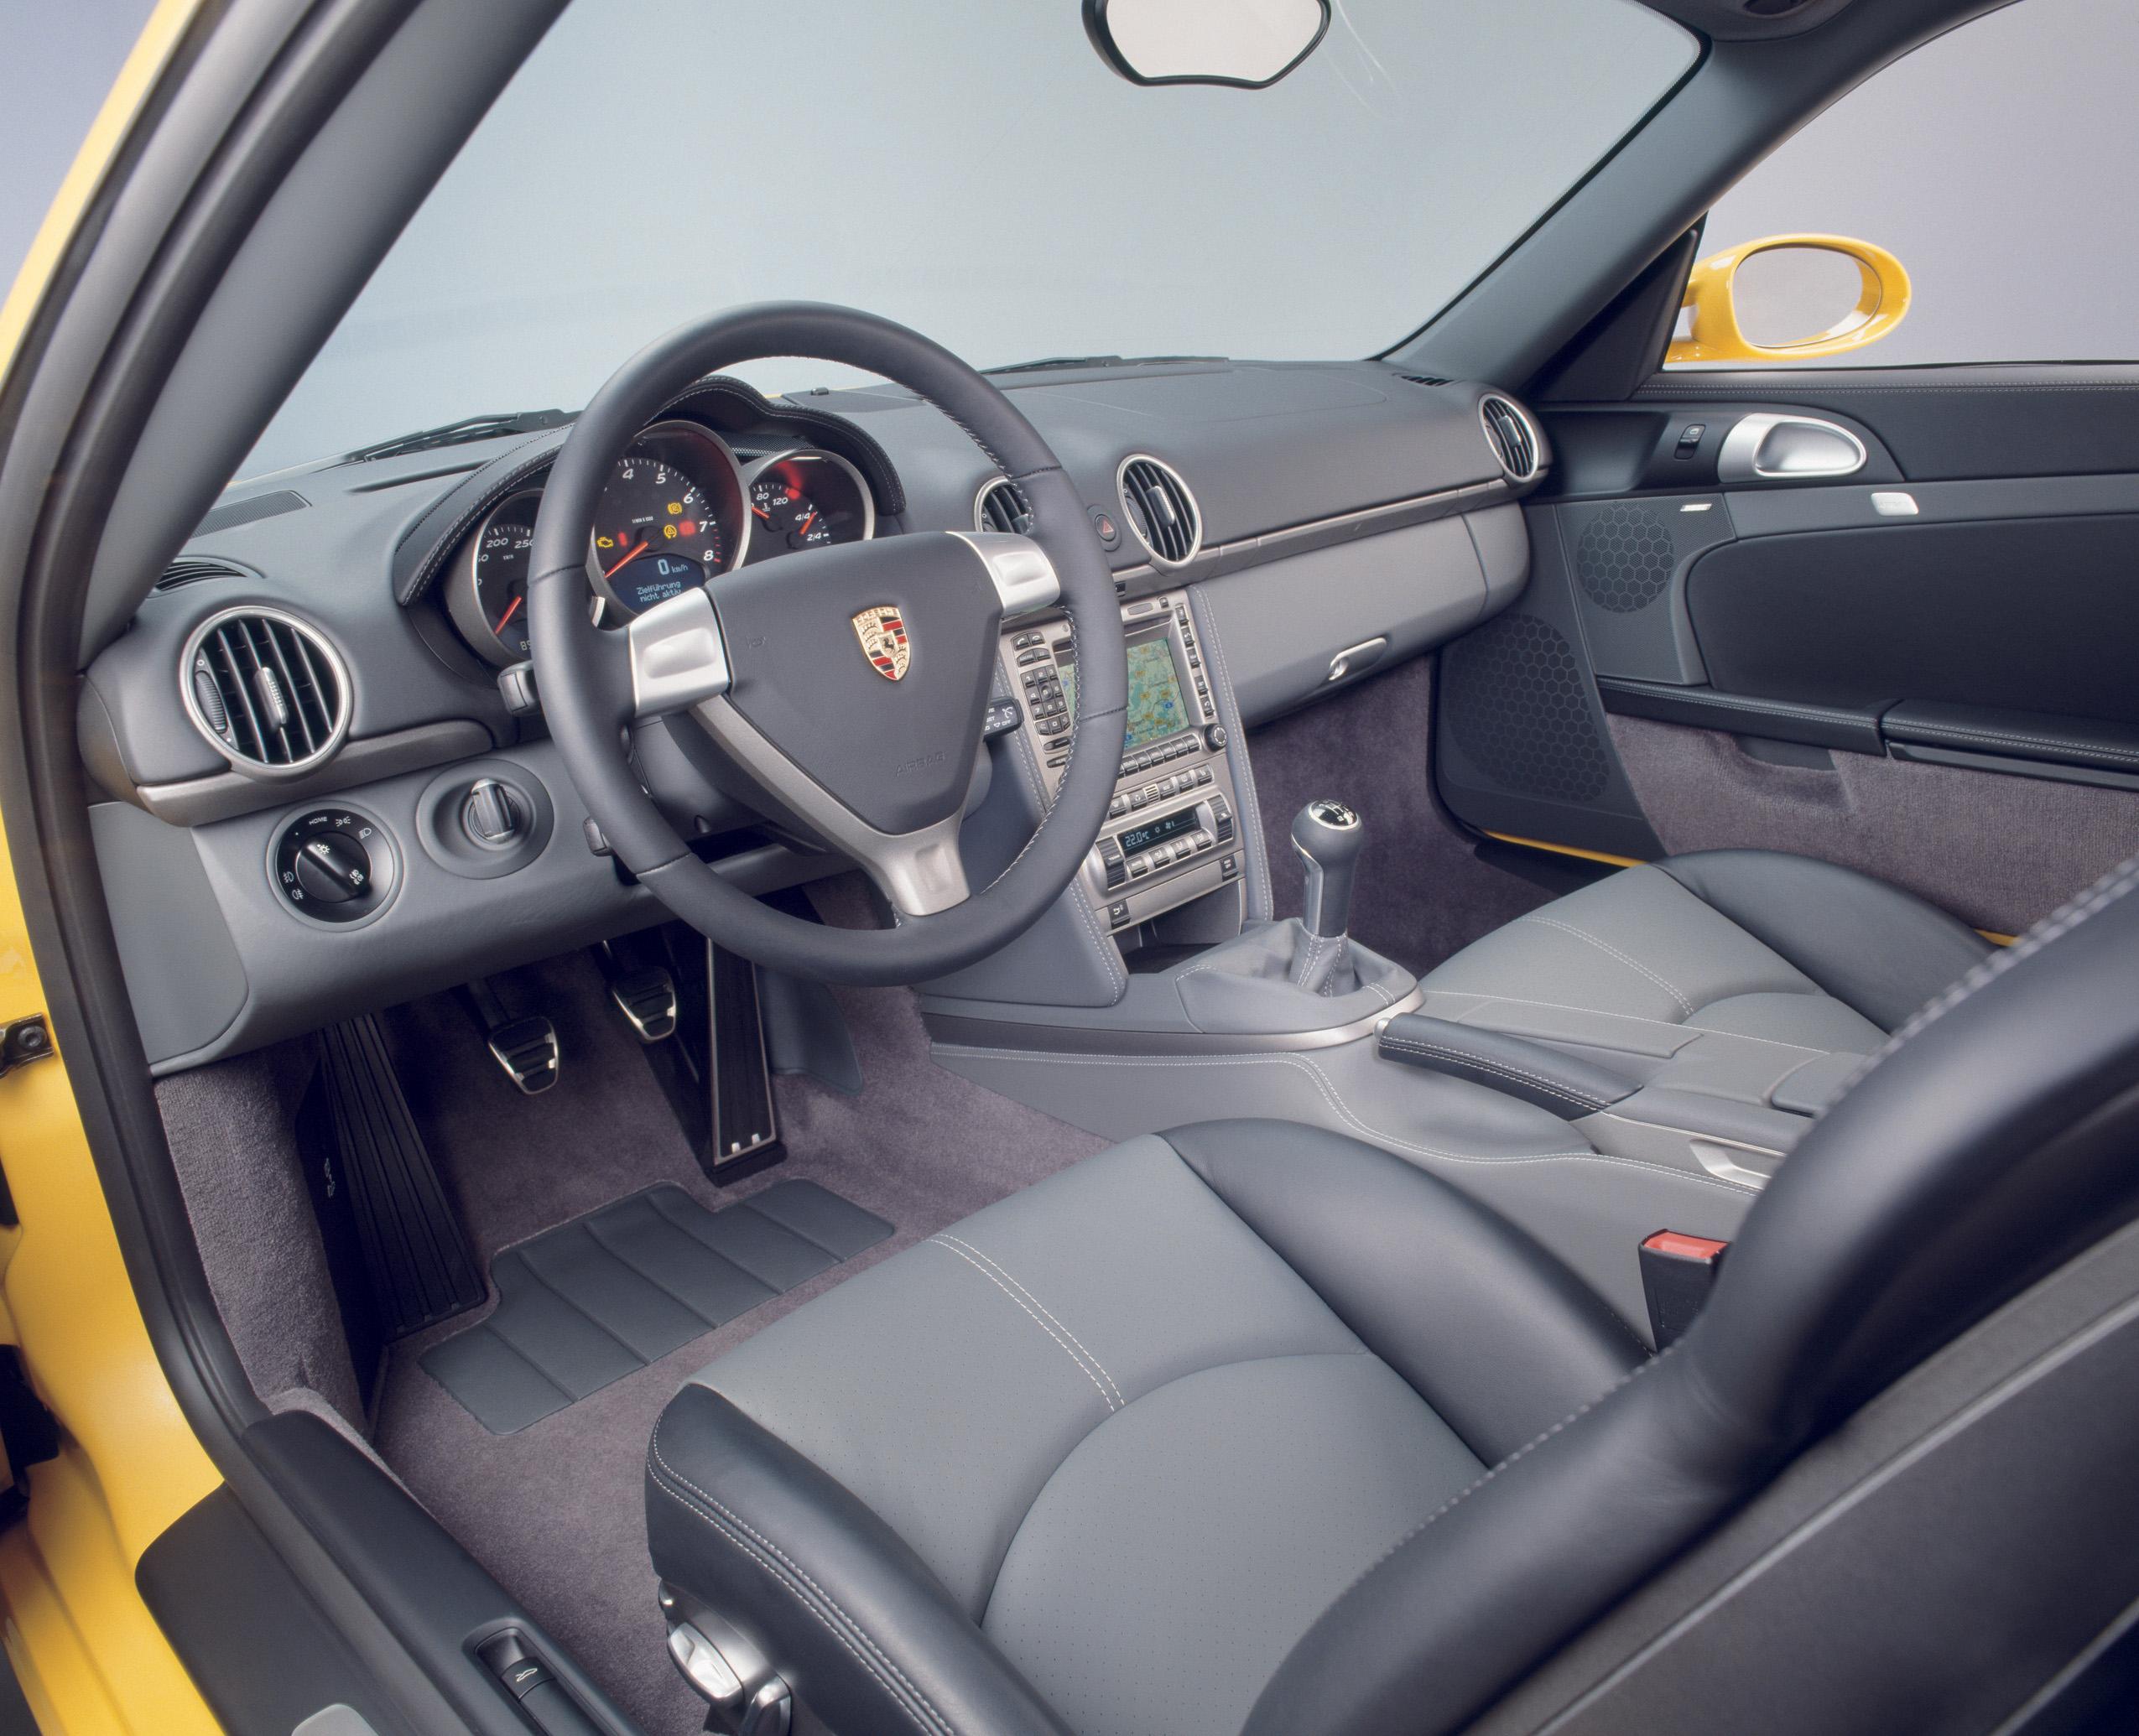 2007 Porsche Cayman interior